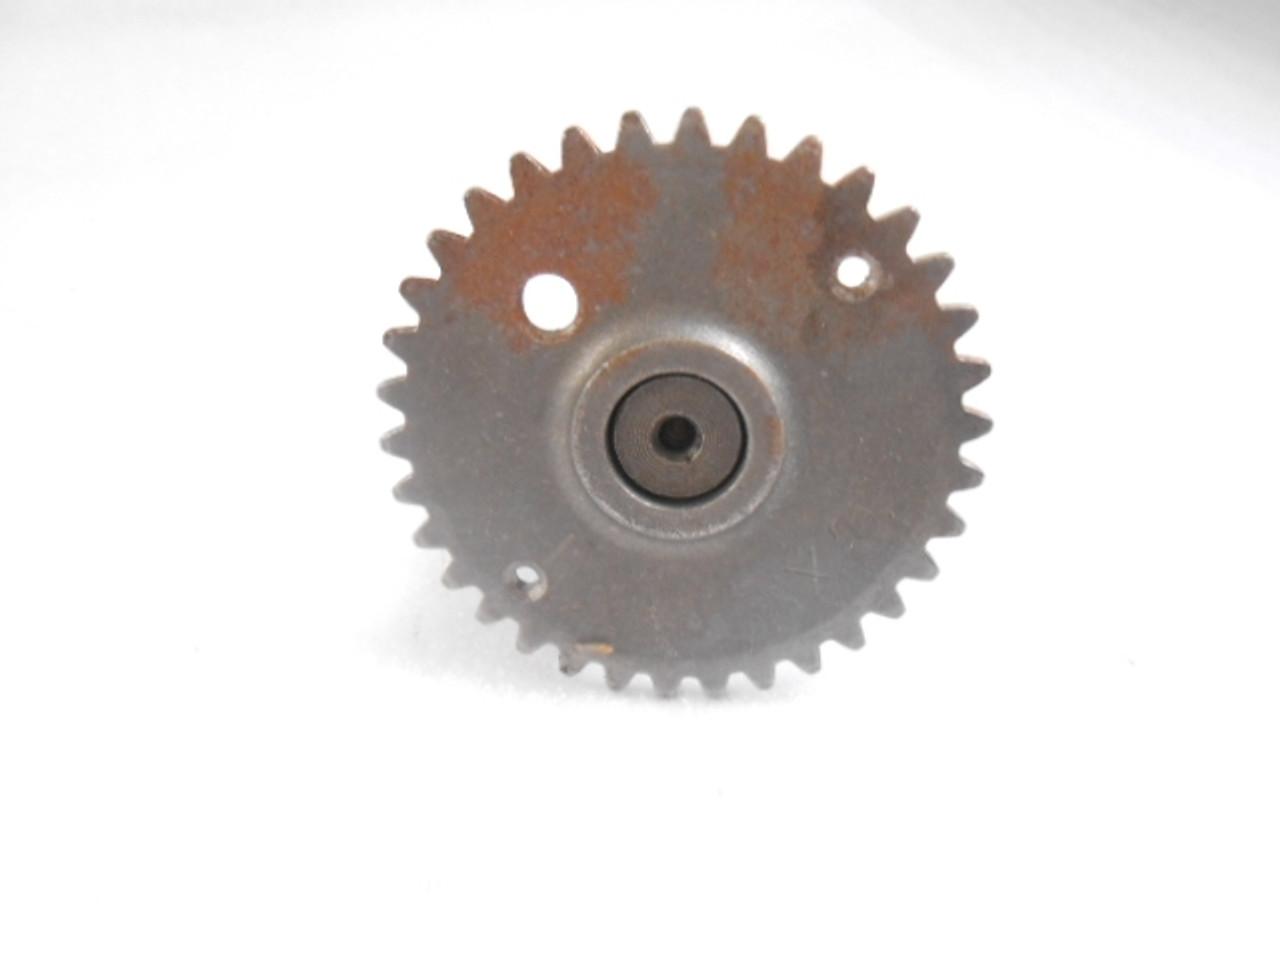 camshaft/cam shaft 10204-a12-6